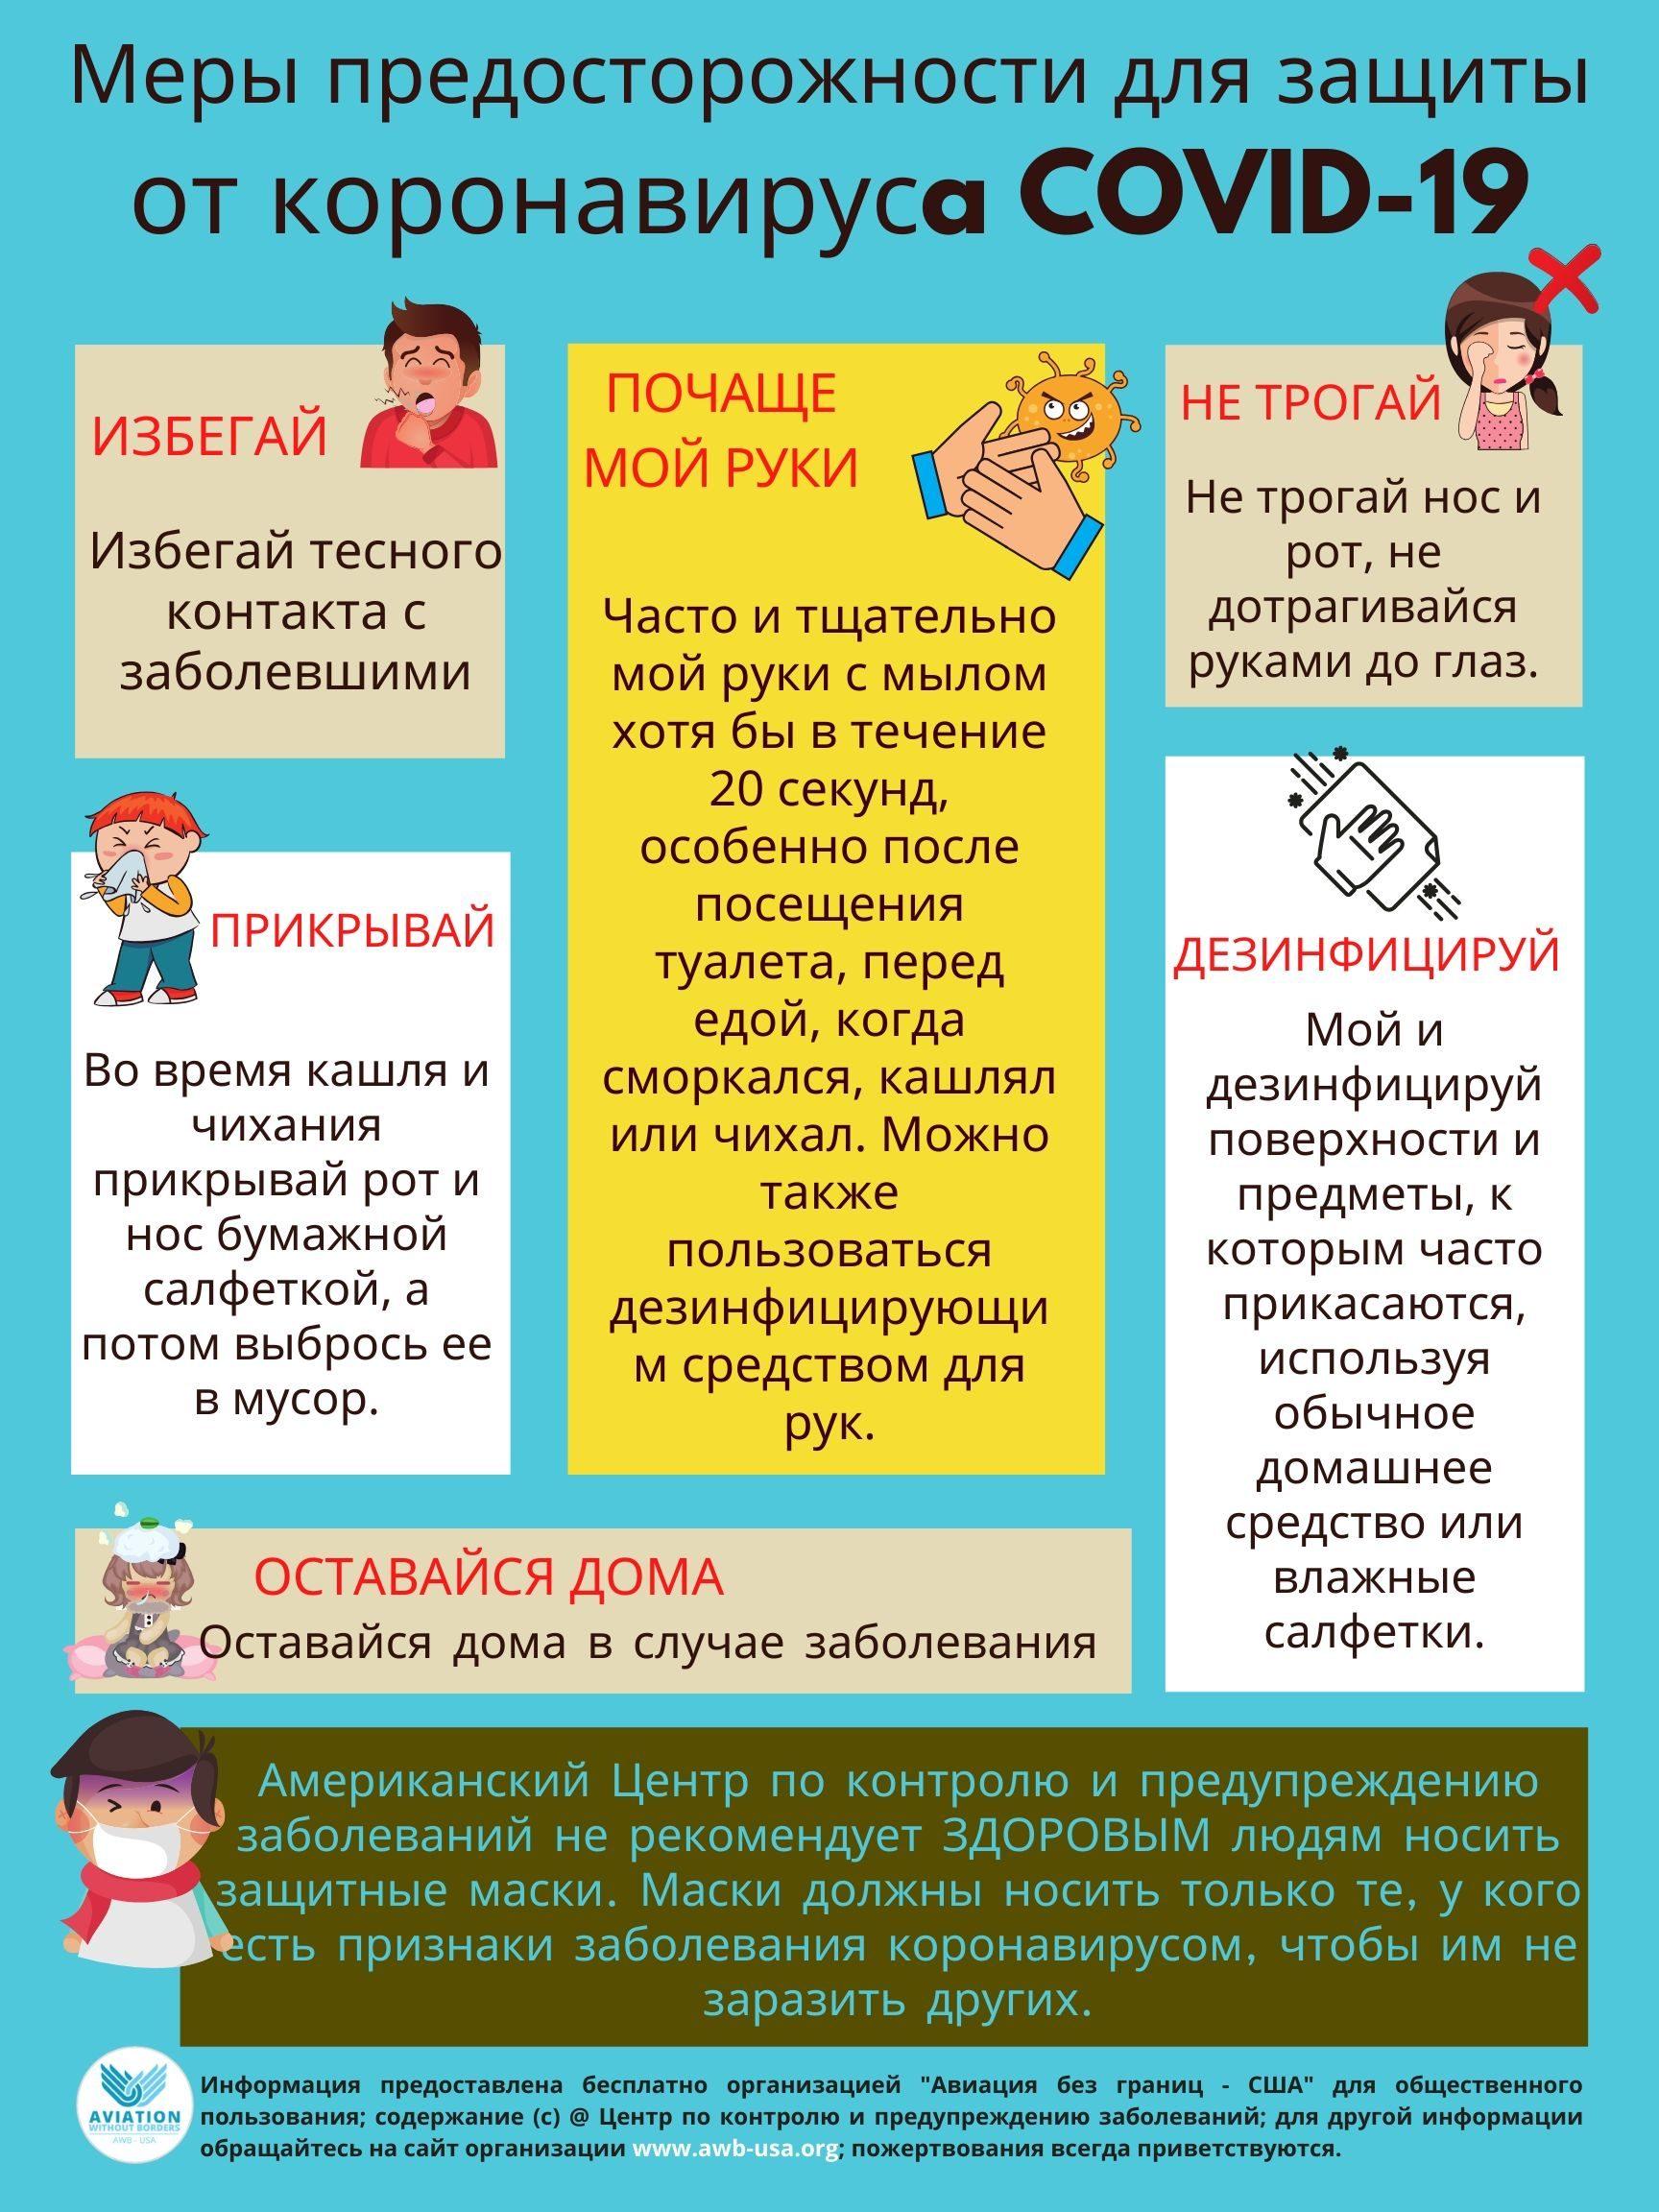 Russian 1